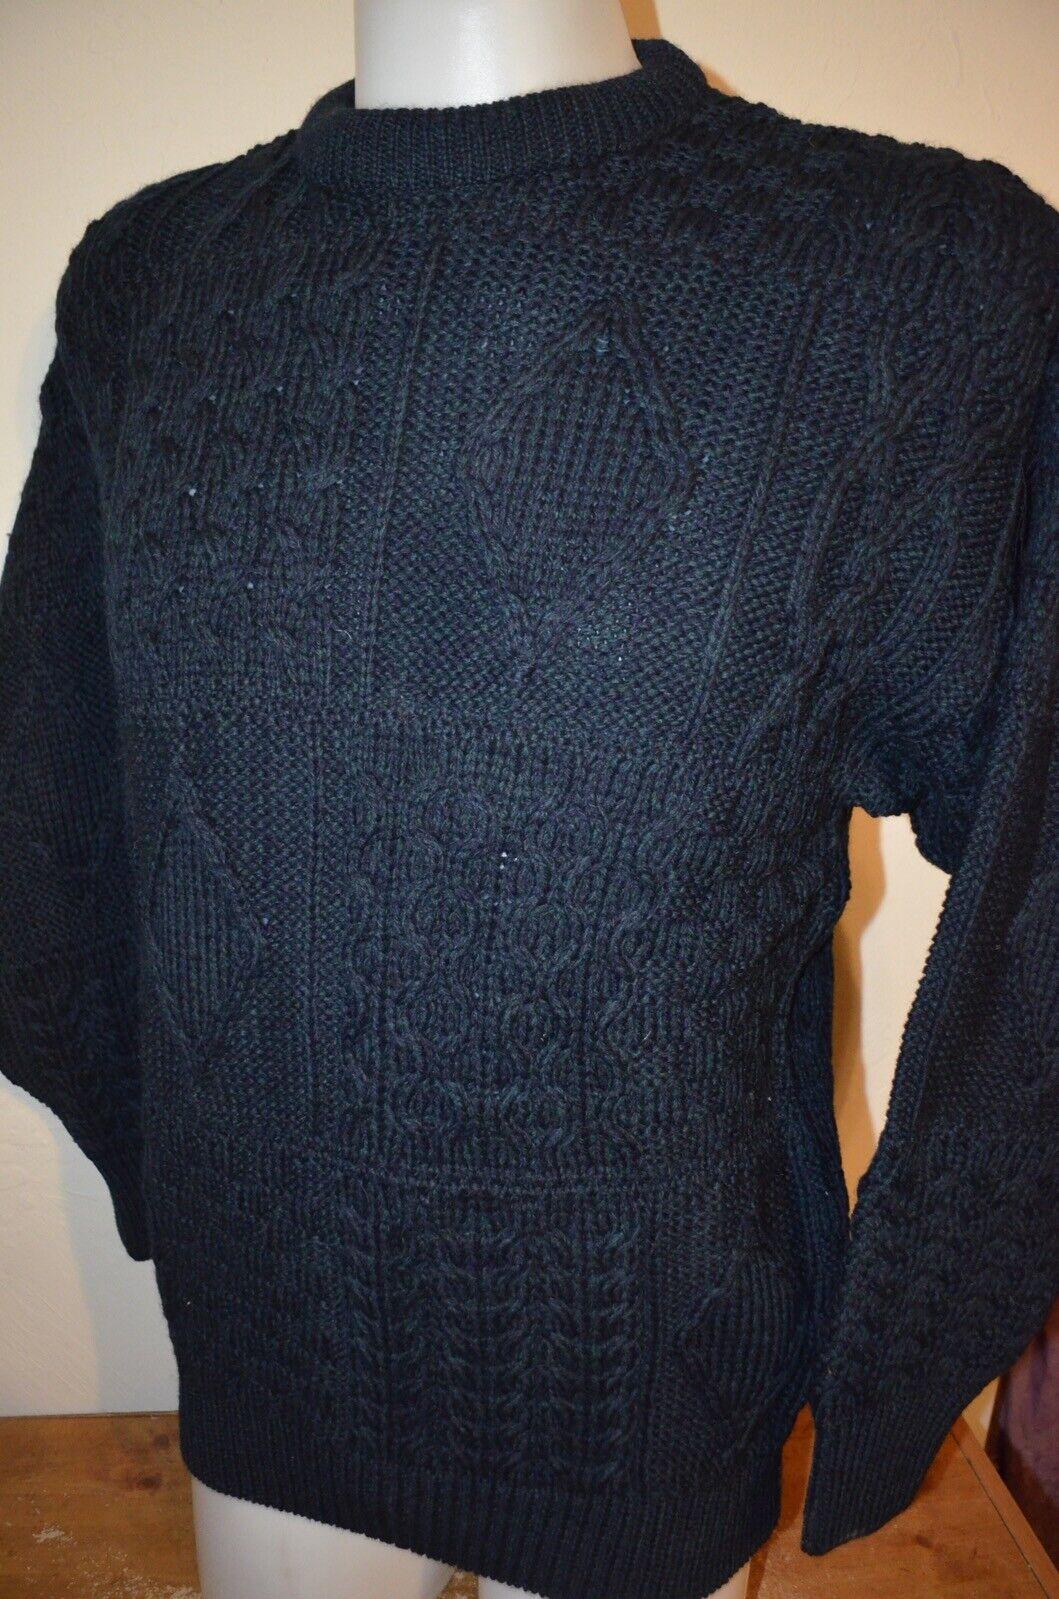 19e8e0f7291e Arancrafts Dark Green Cable Heavy Knit Fisherman Crew Ireland Wool M Sweater  NWT. CARHARTT MEN S ...